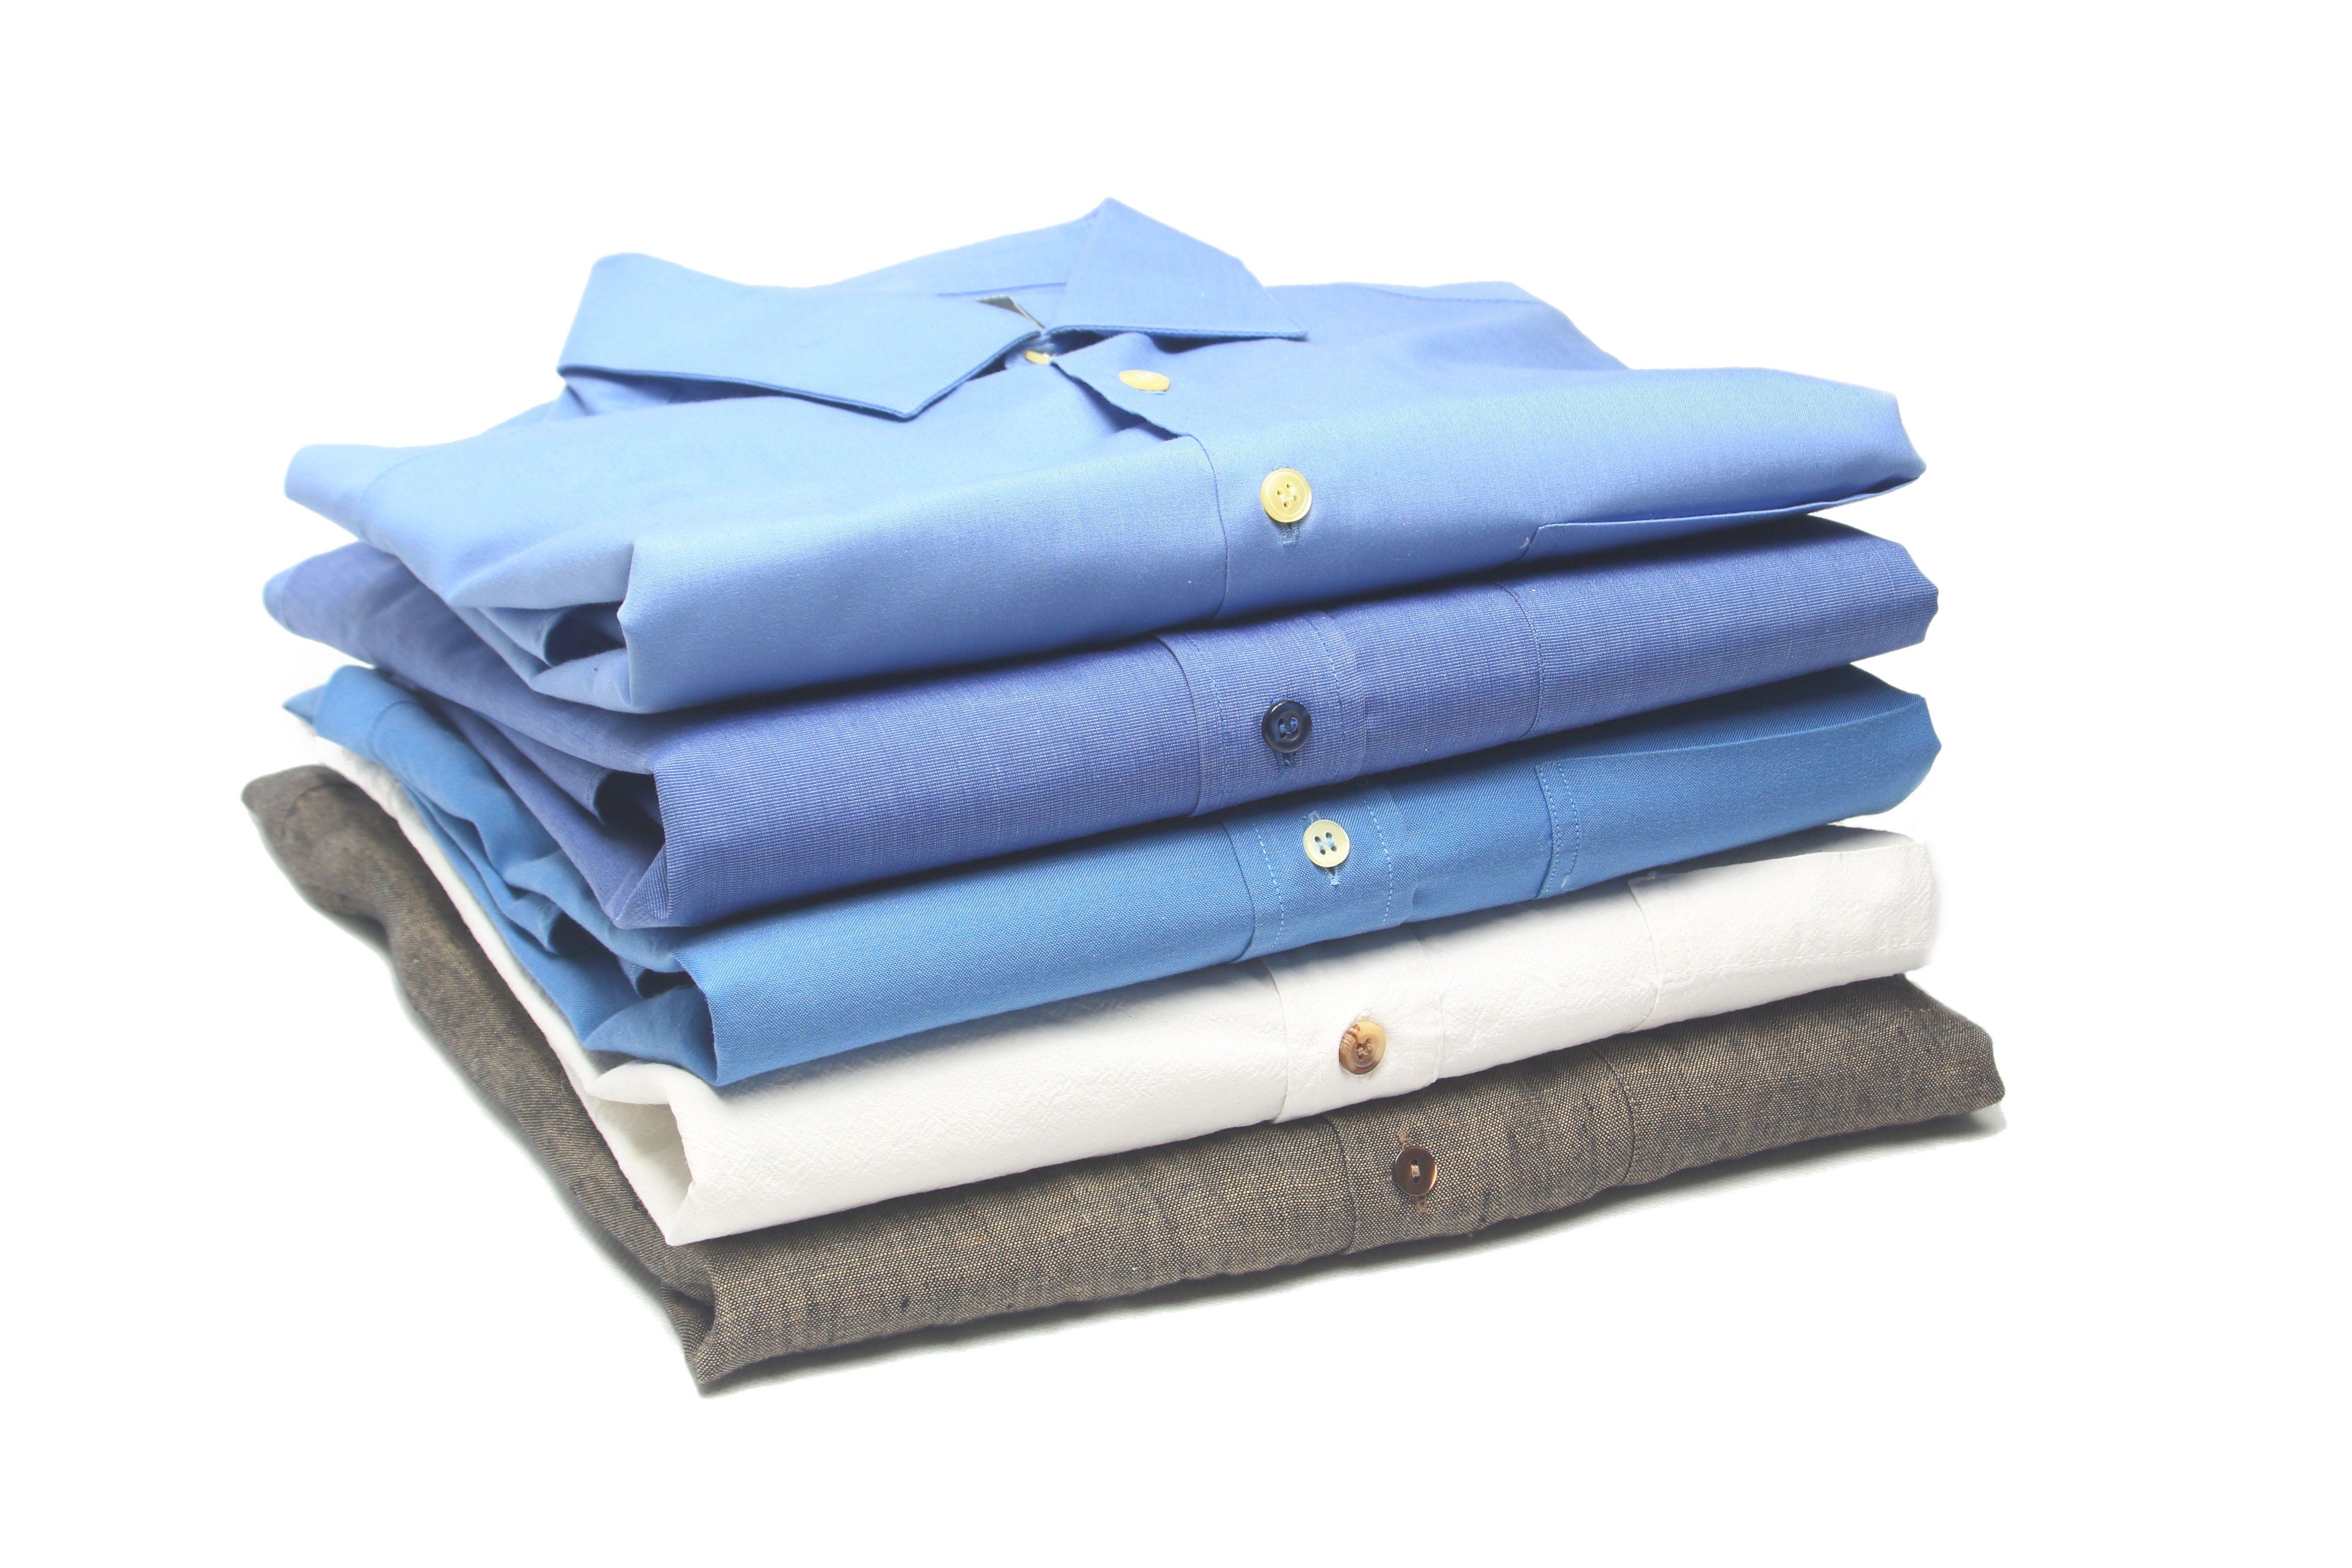 Servicio de embolsado y prendas dobladas: Servicios de Tinteco tintorerías